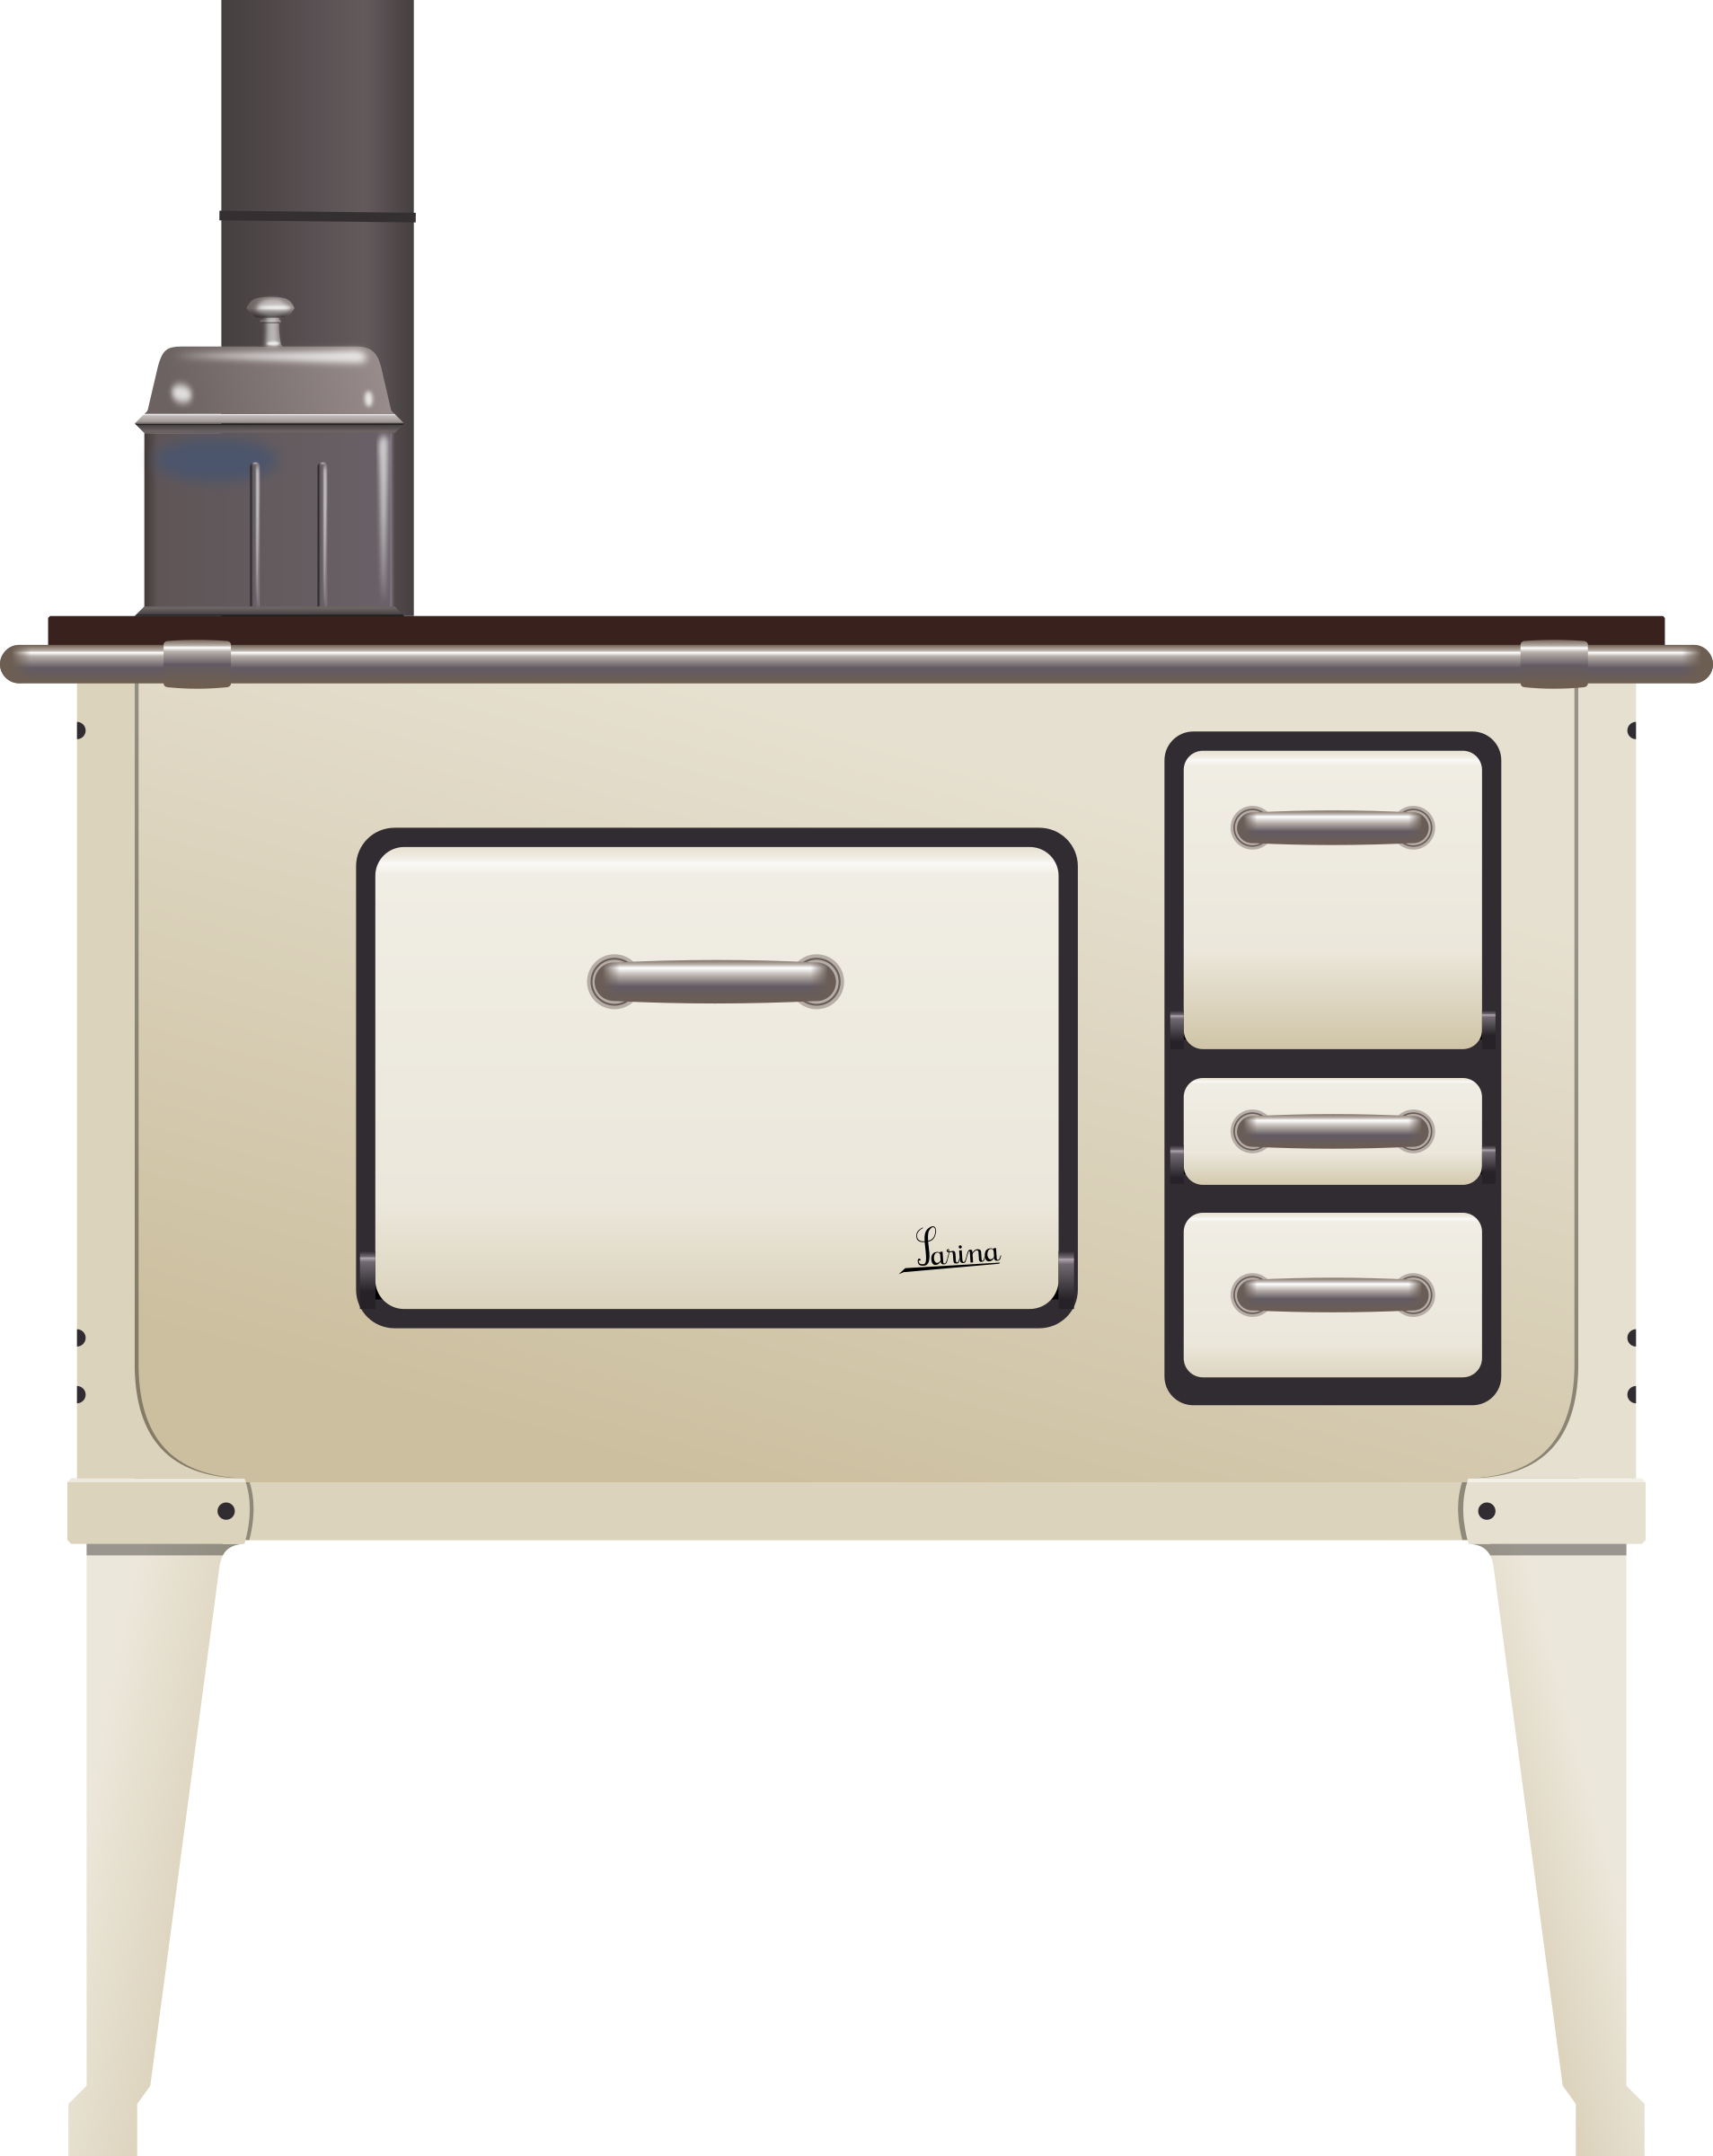 Stove big image png. Kitchen clipart kitchen furniture